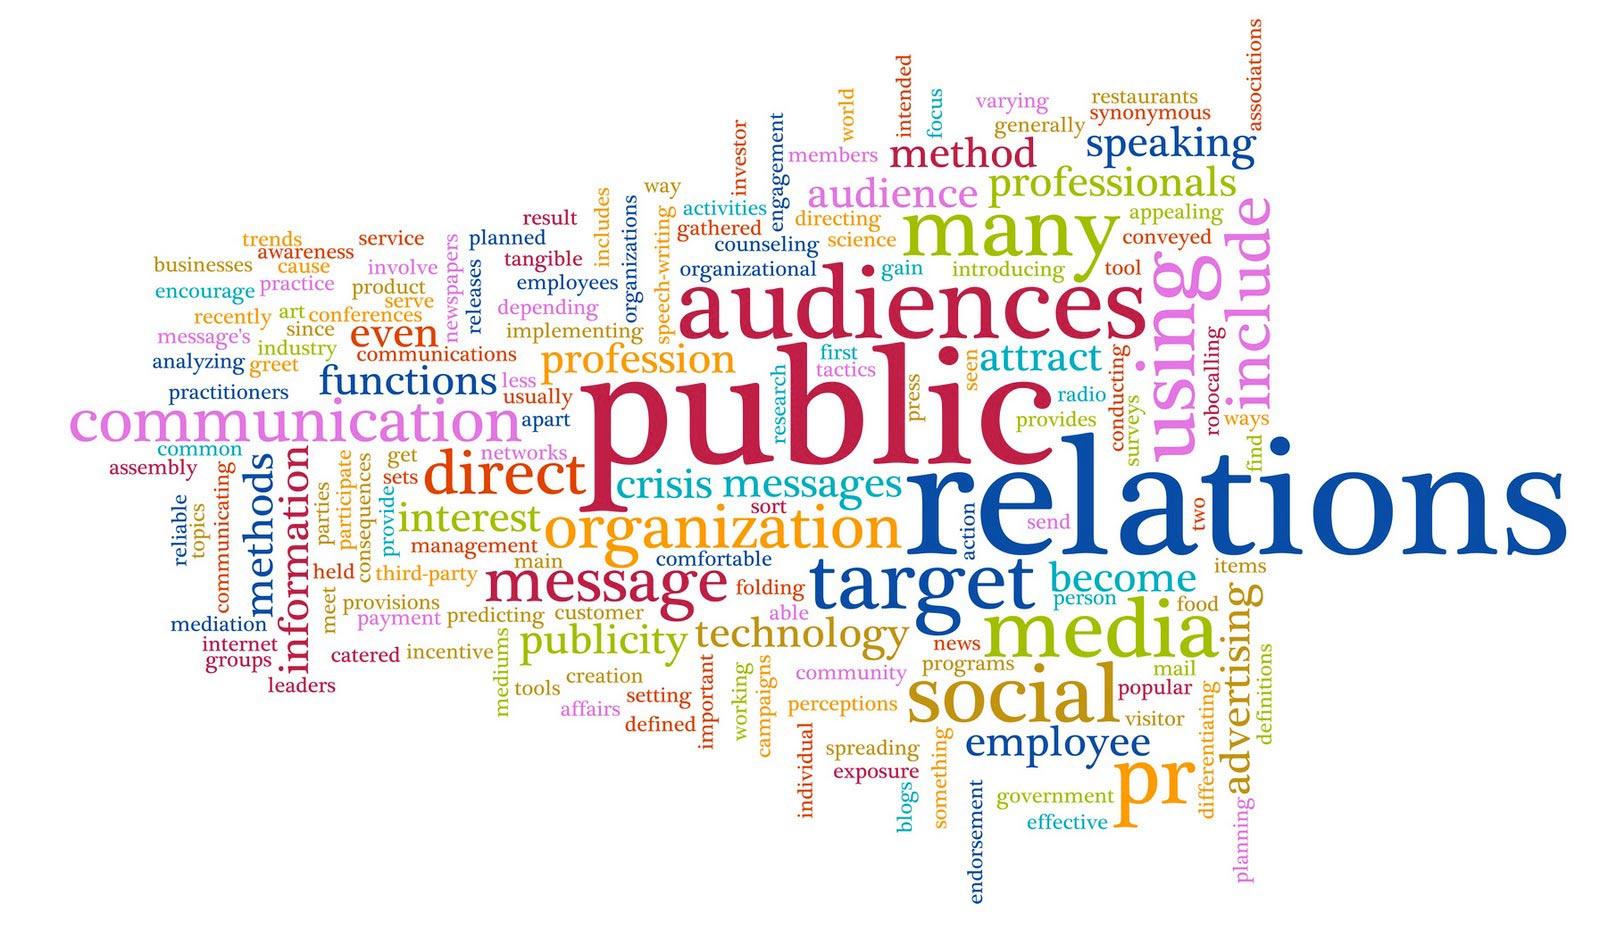 public relations pr social media